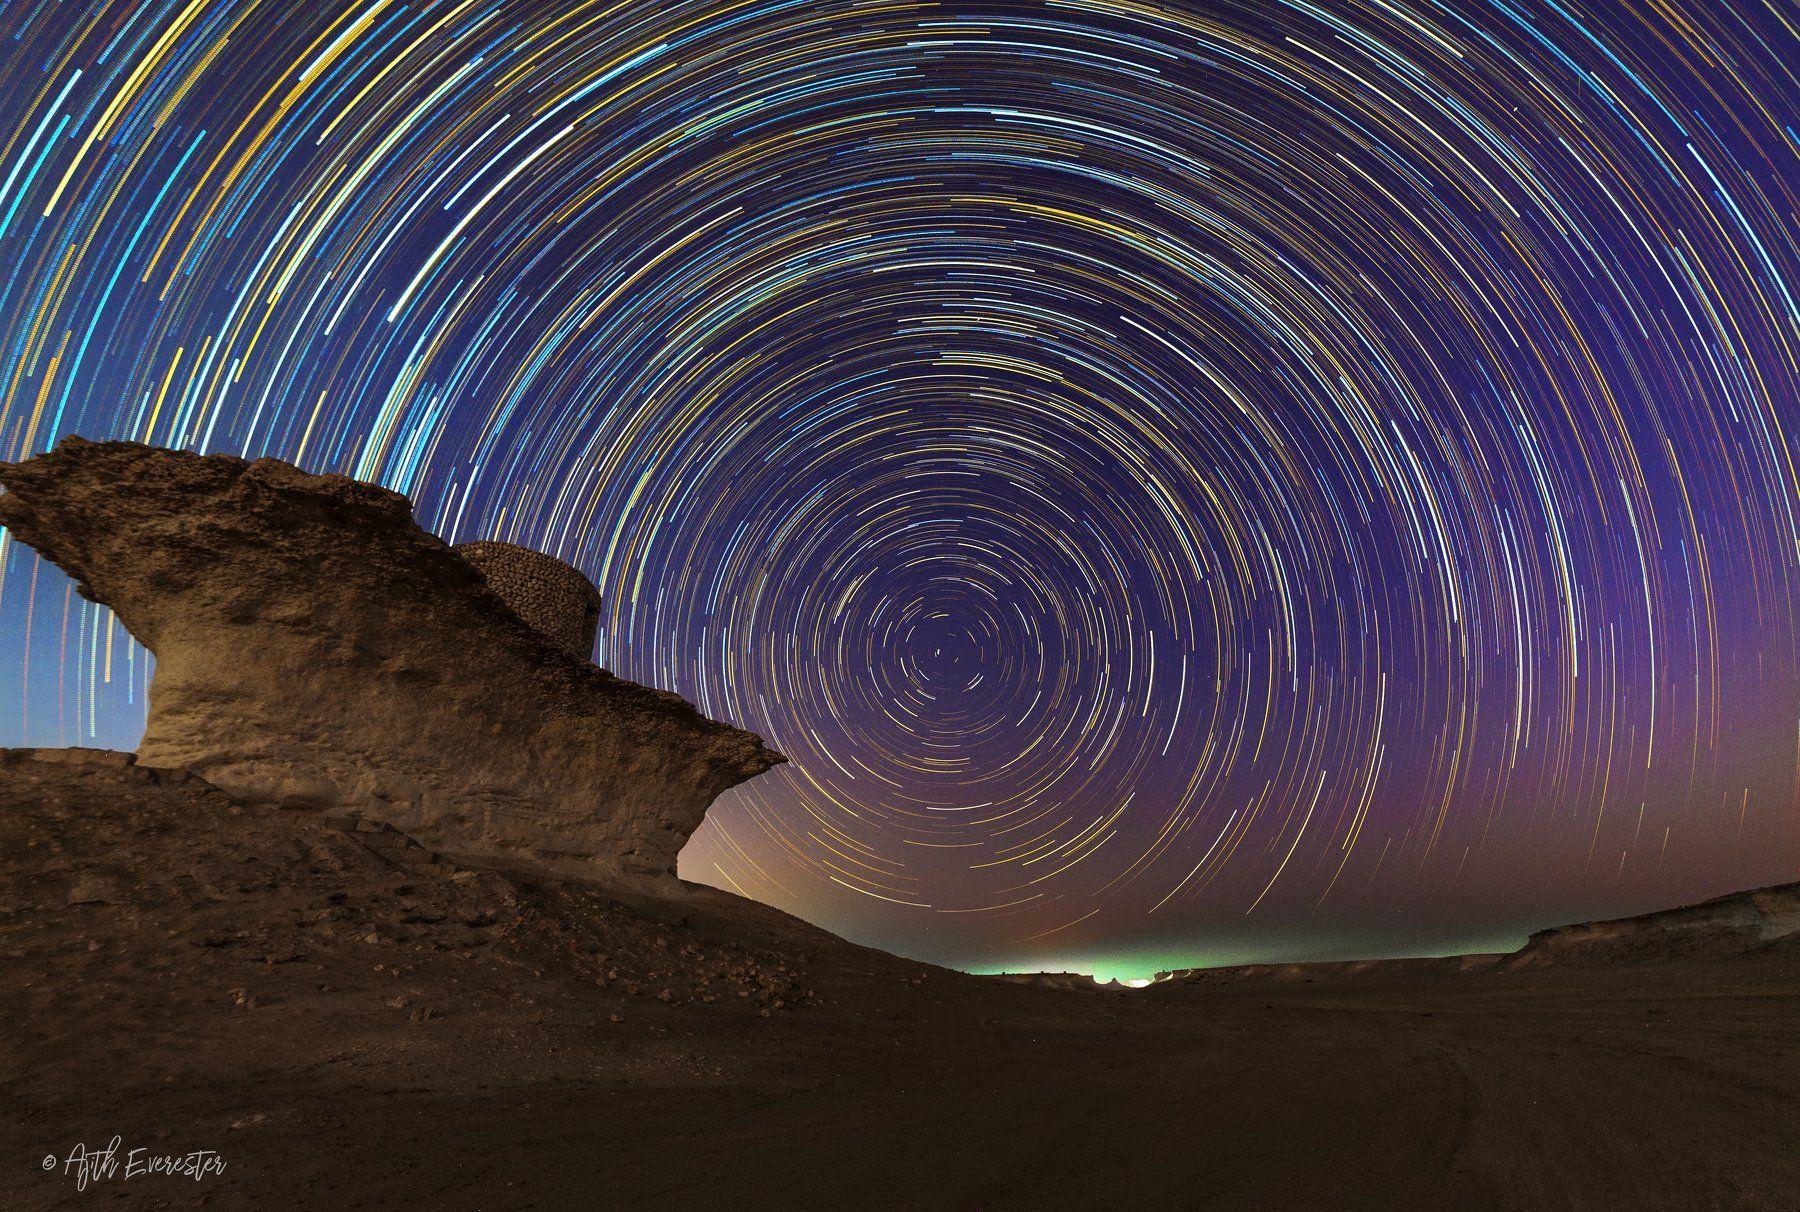 Qatar, doha, star, astro, Ajith Everester